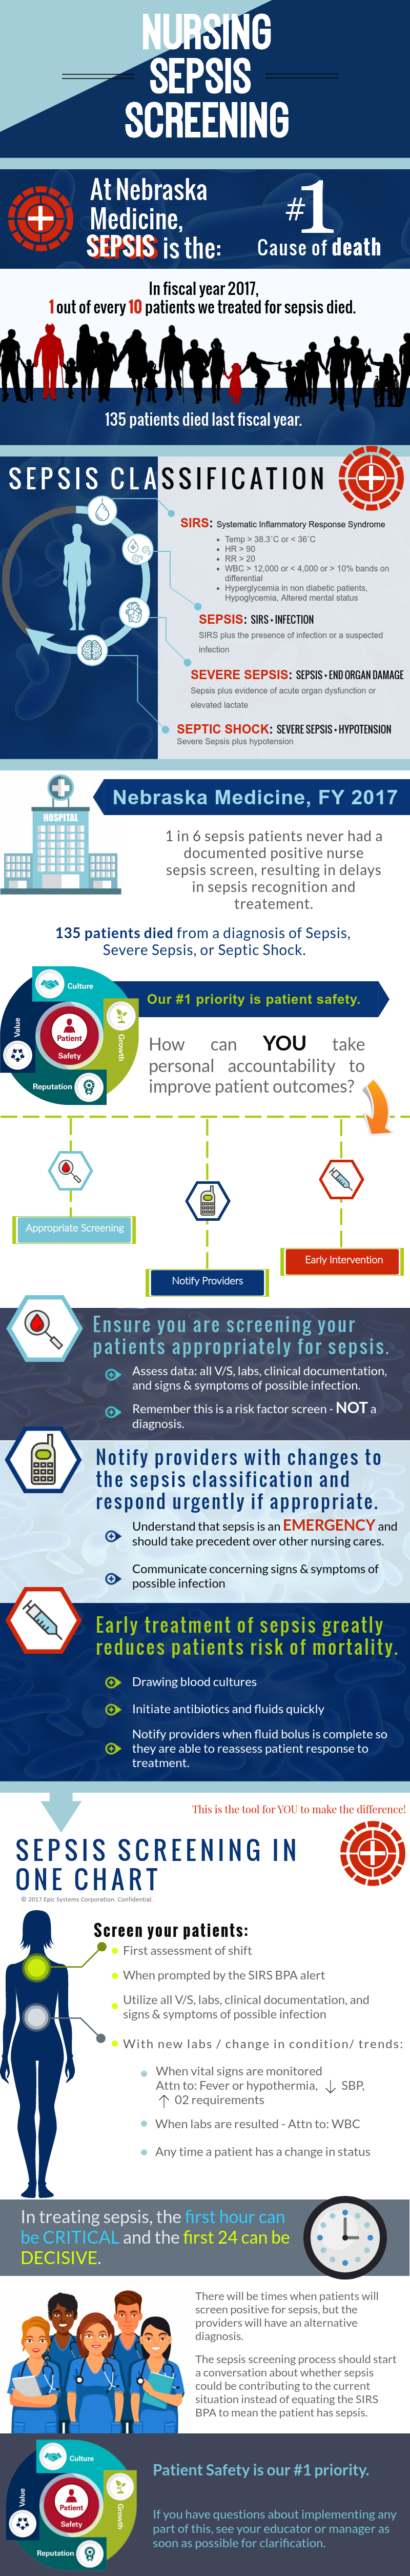 Nurse-Sepsis-Screening.png